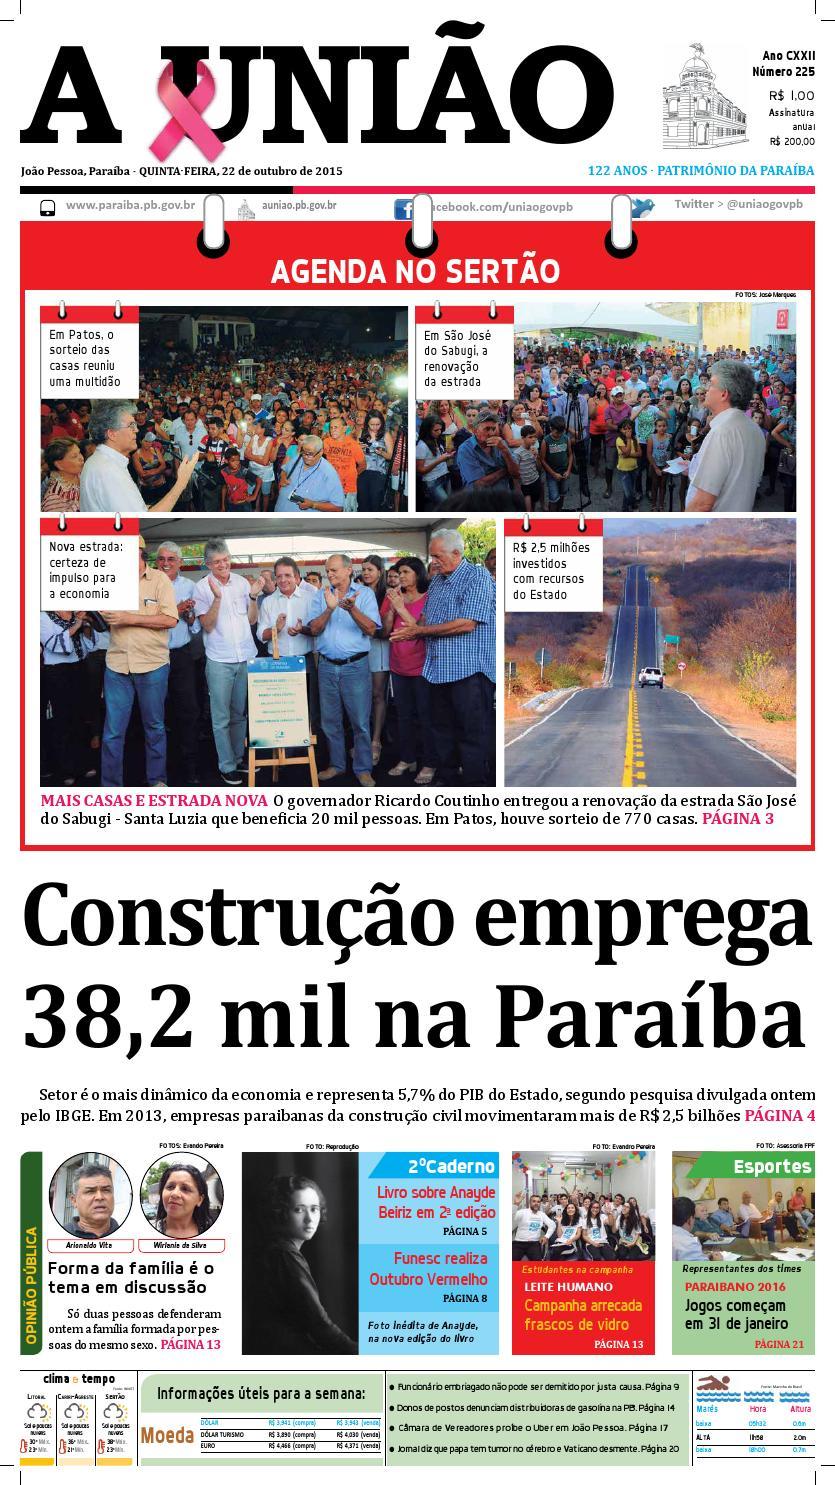 Jornal A União - 22 10 2015 by Jornal A União - issuu a34aeca0de383